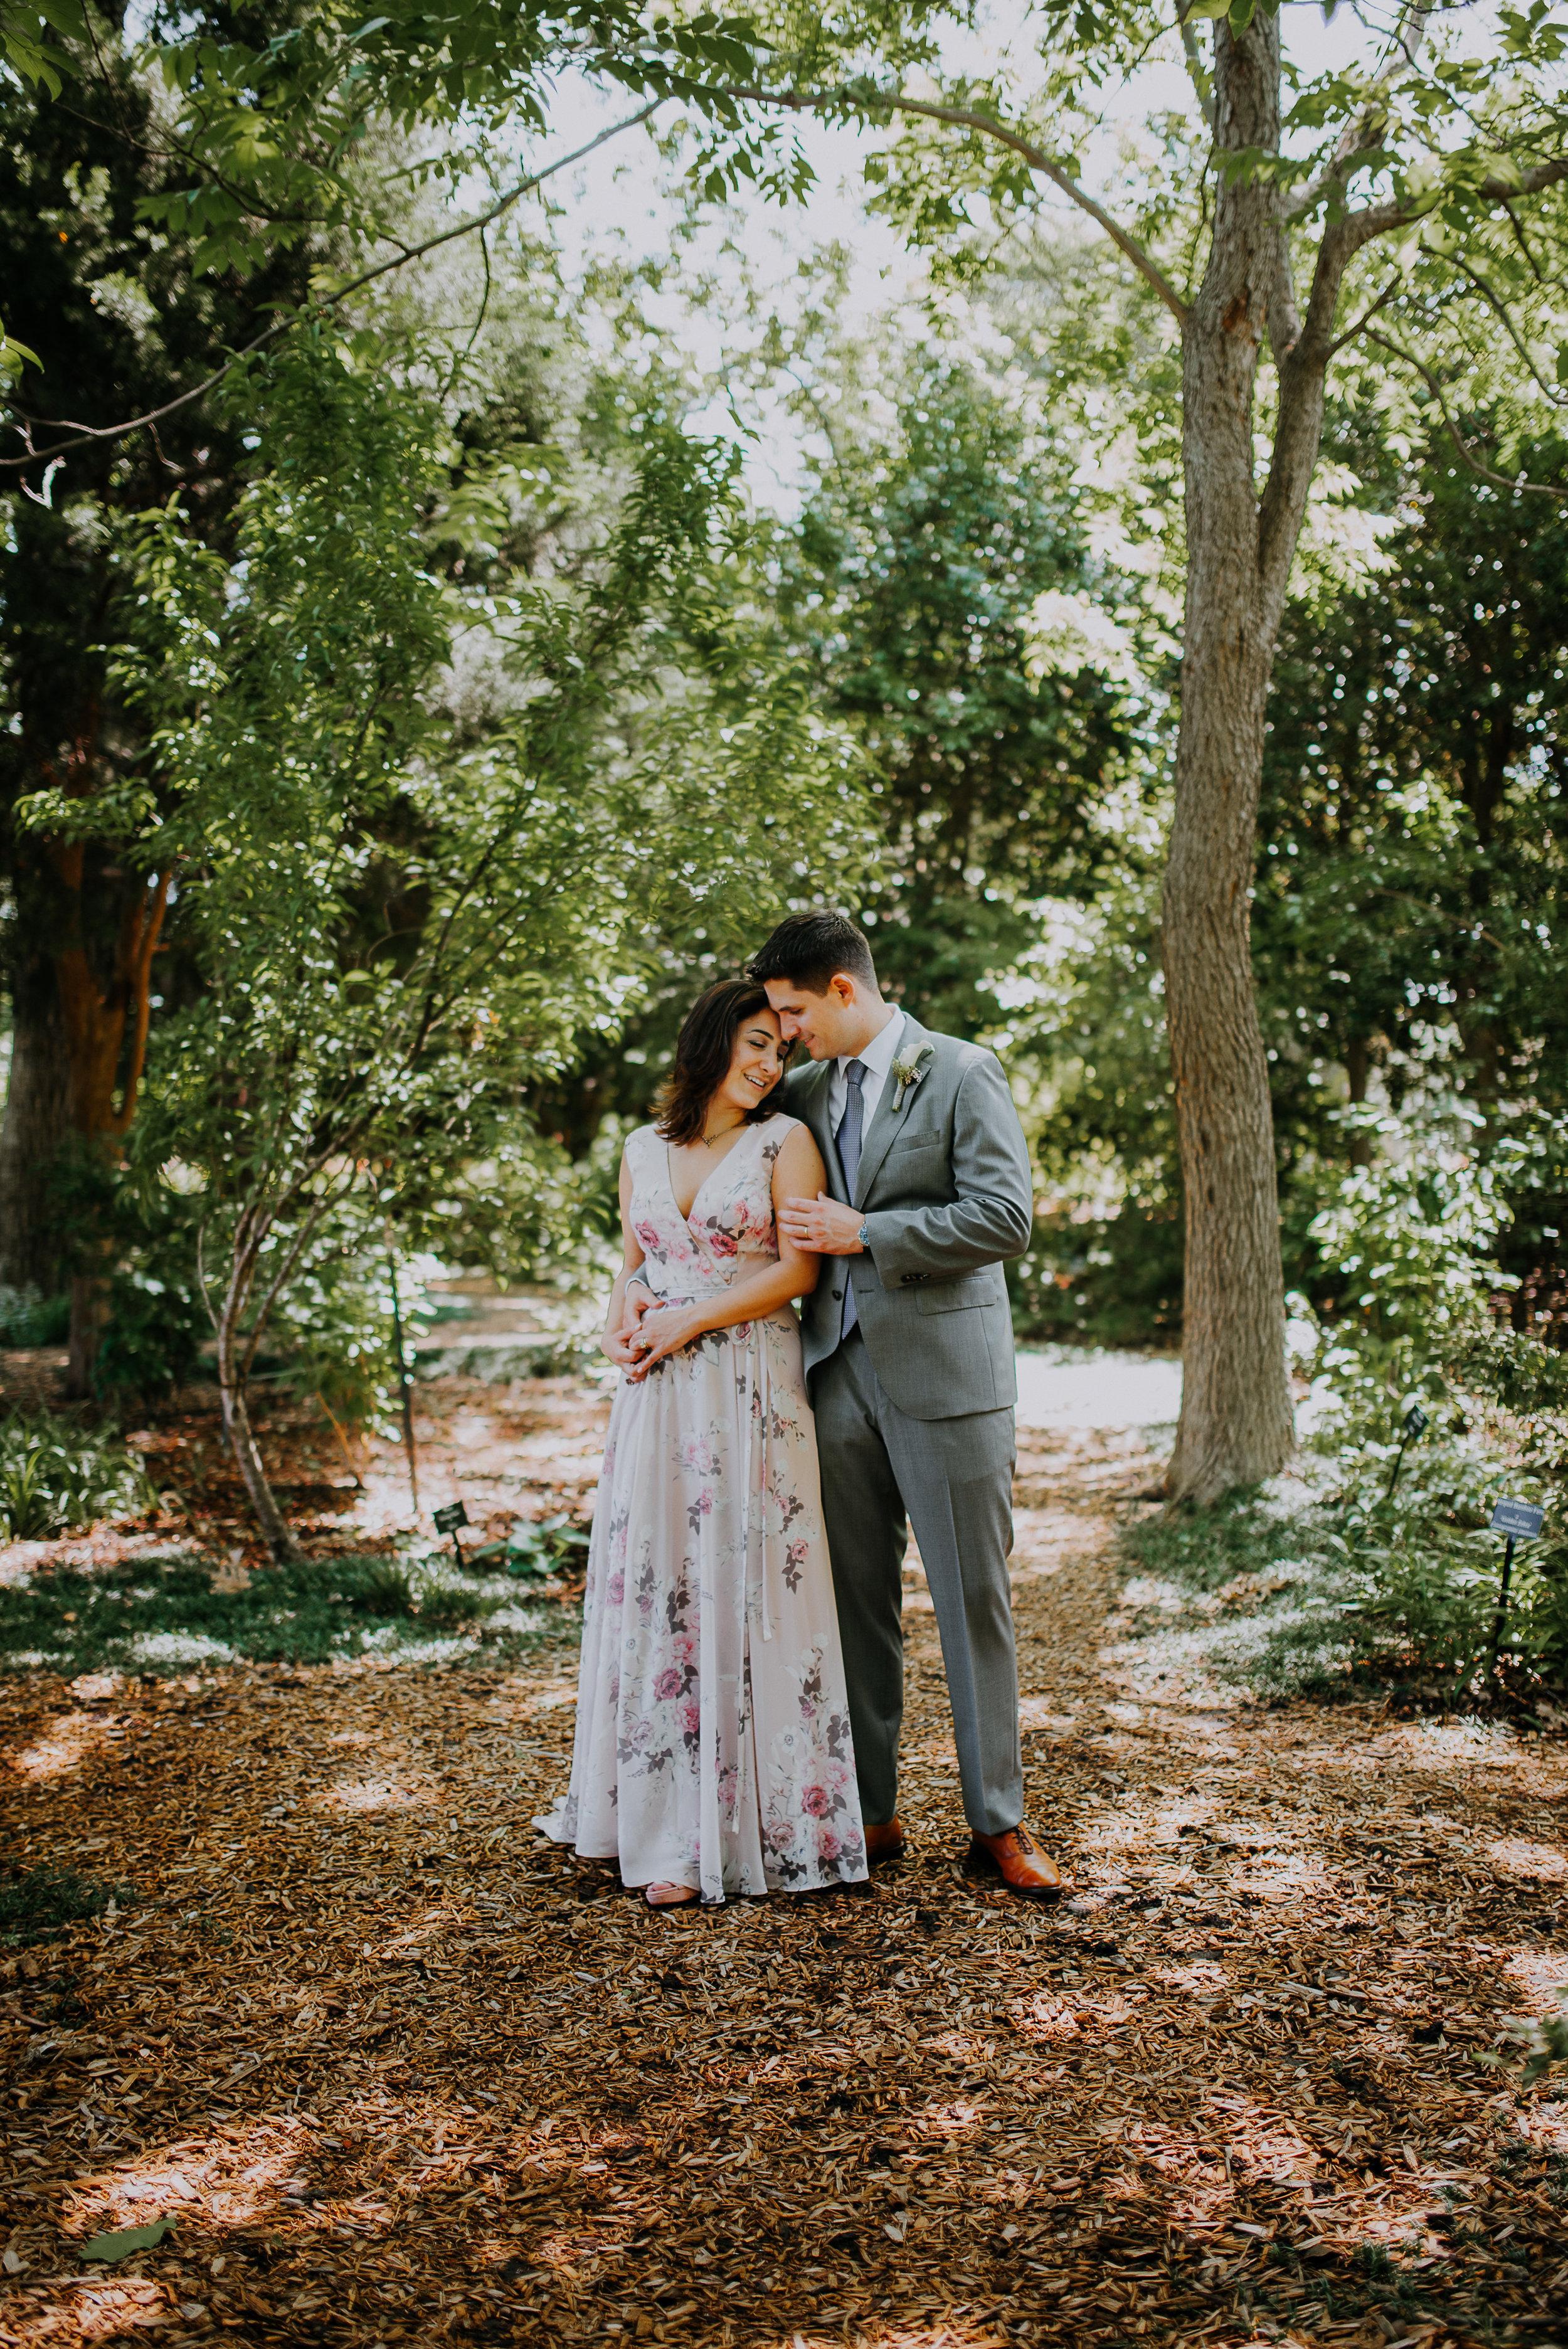 Dallas-fort-worth-wedding-photographer-dallas-arboretum-intimate-wedding-dallas-texas-34